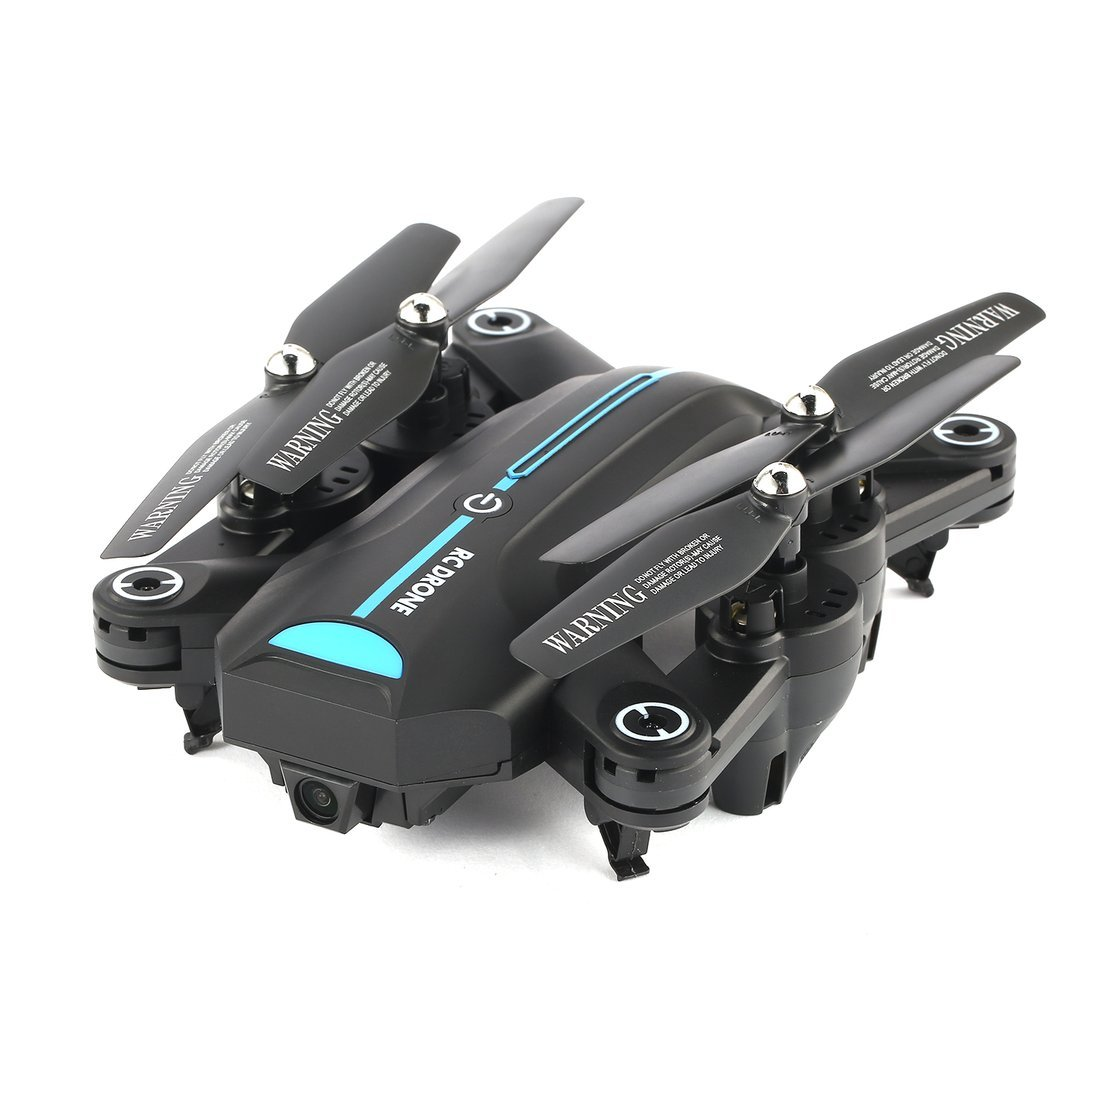 A6W Faltbare WiFi FPV 720 P Weitwinkel HD Kamera Schwerkraft Sensor Höhe Halten Headless Modus RC Drone Quadcopter Zwei batterien